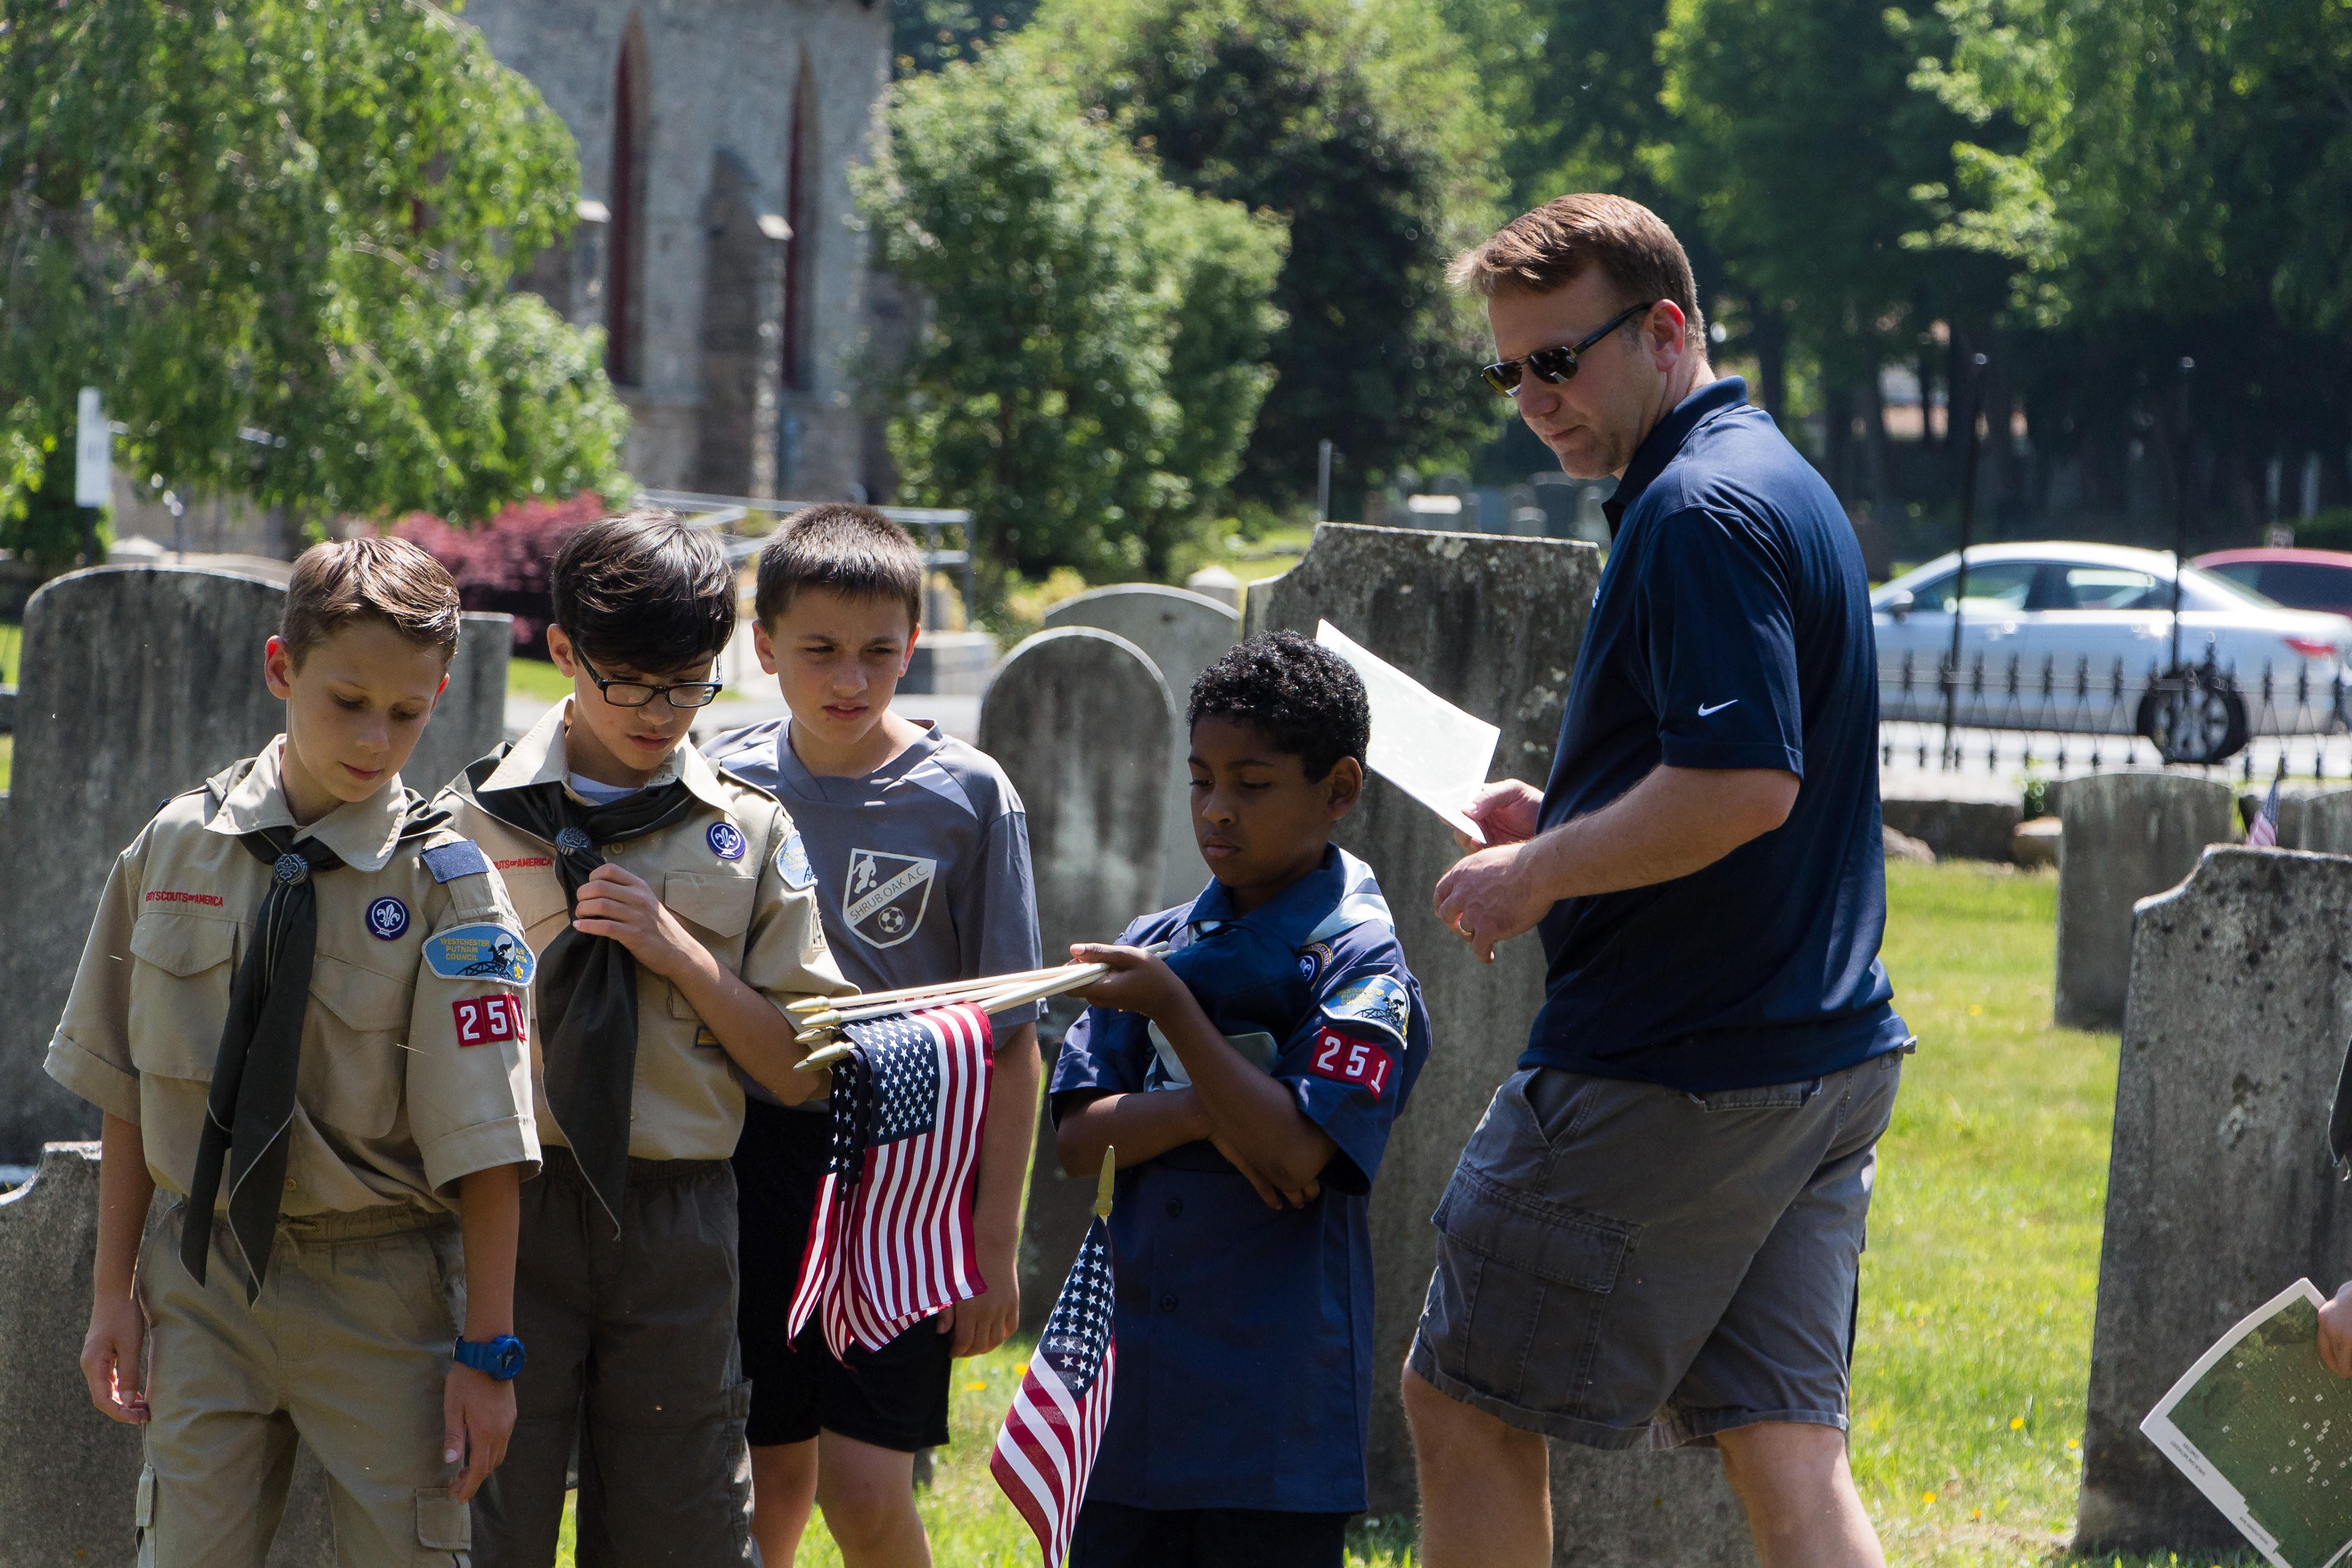 8a1299492012596ec911_20160528_Boy_Scouts_Memorial_Day_Flag_Settng_047.jpg